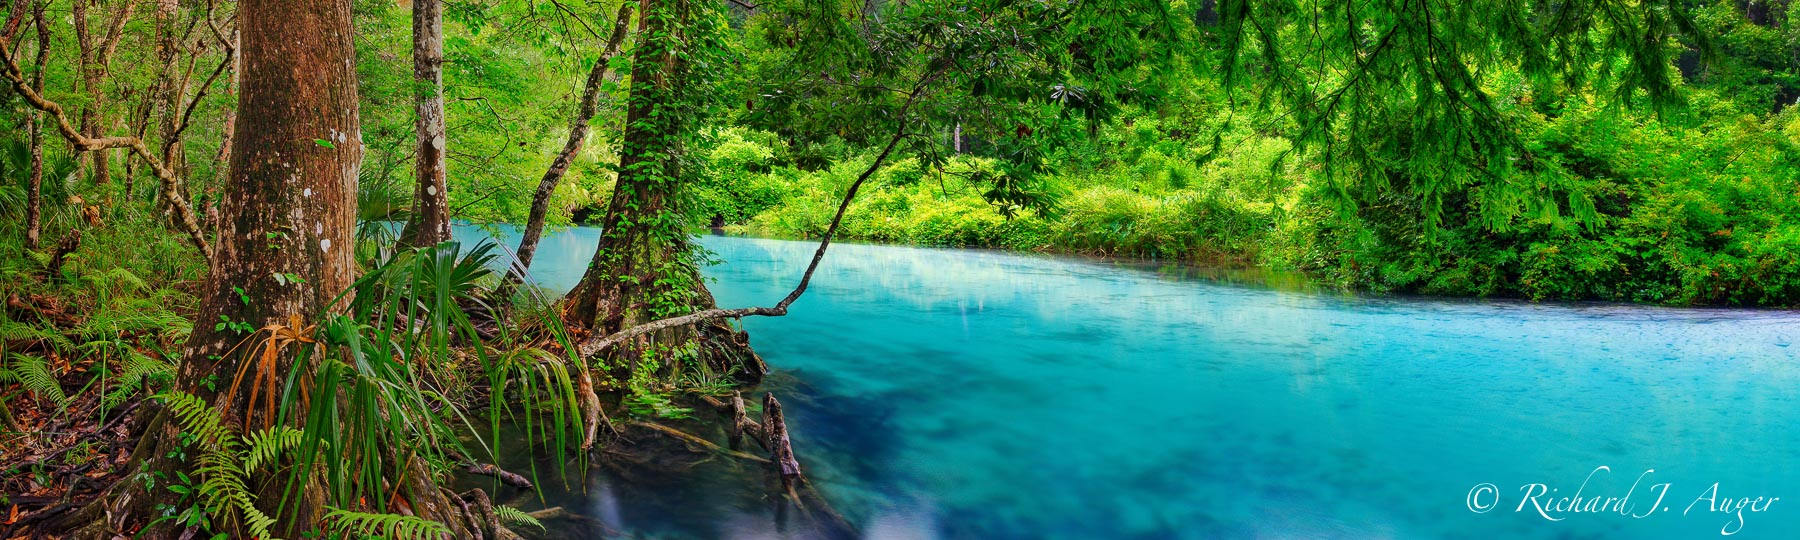 Weeki Wachee, Spring, River, Florida, water, cypress, photograph, canvas, photographer, Richard Auger